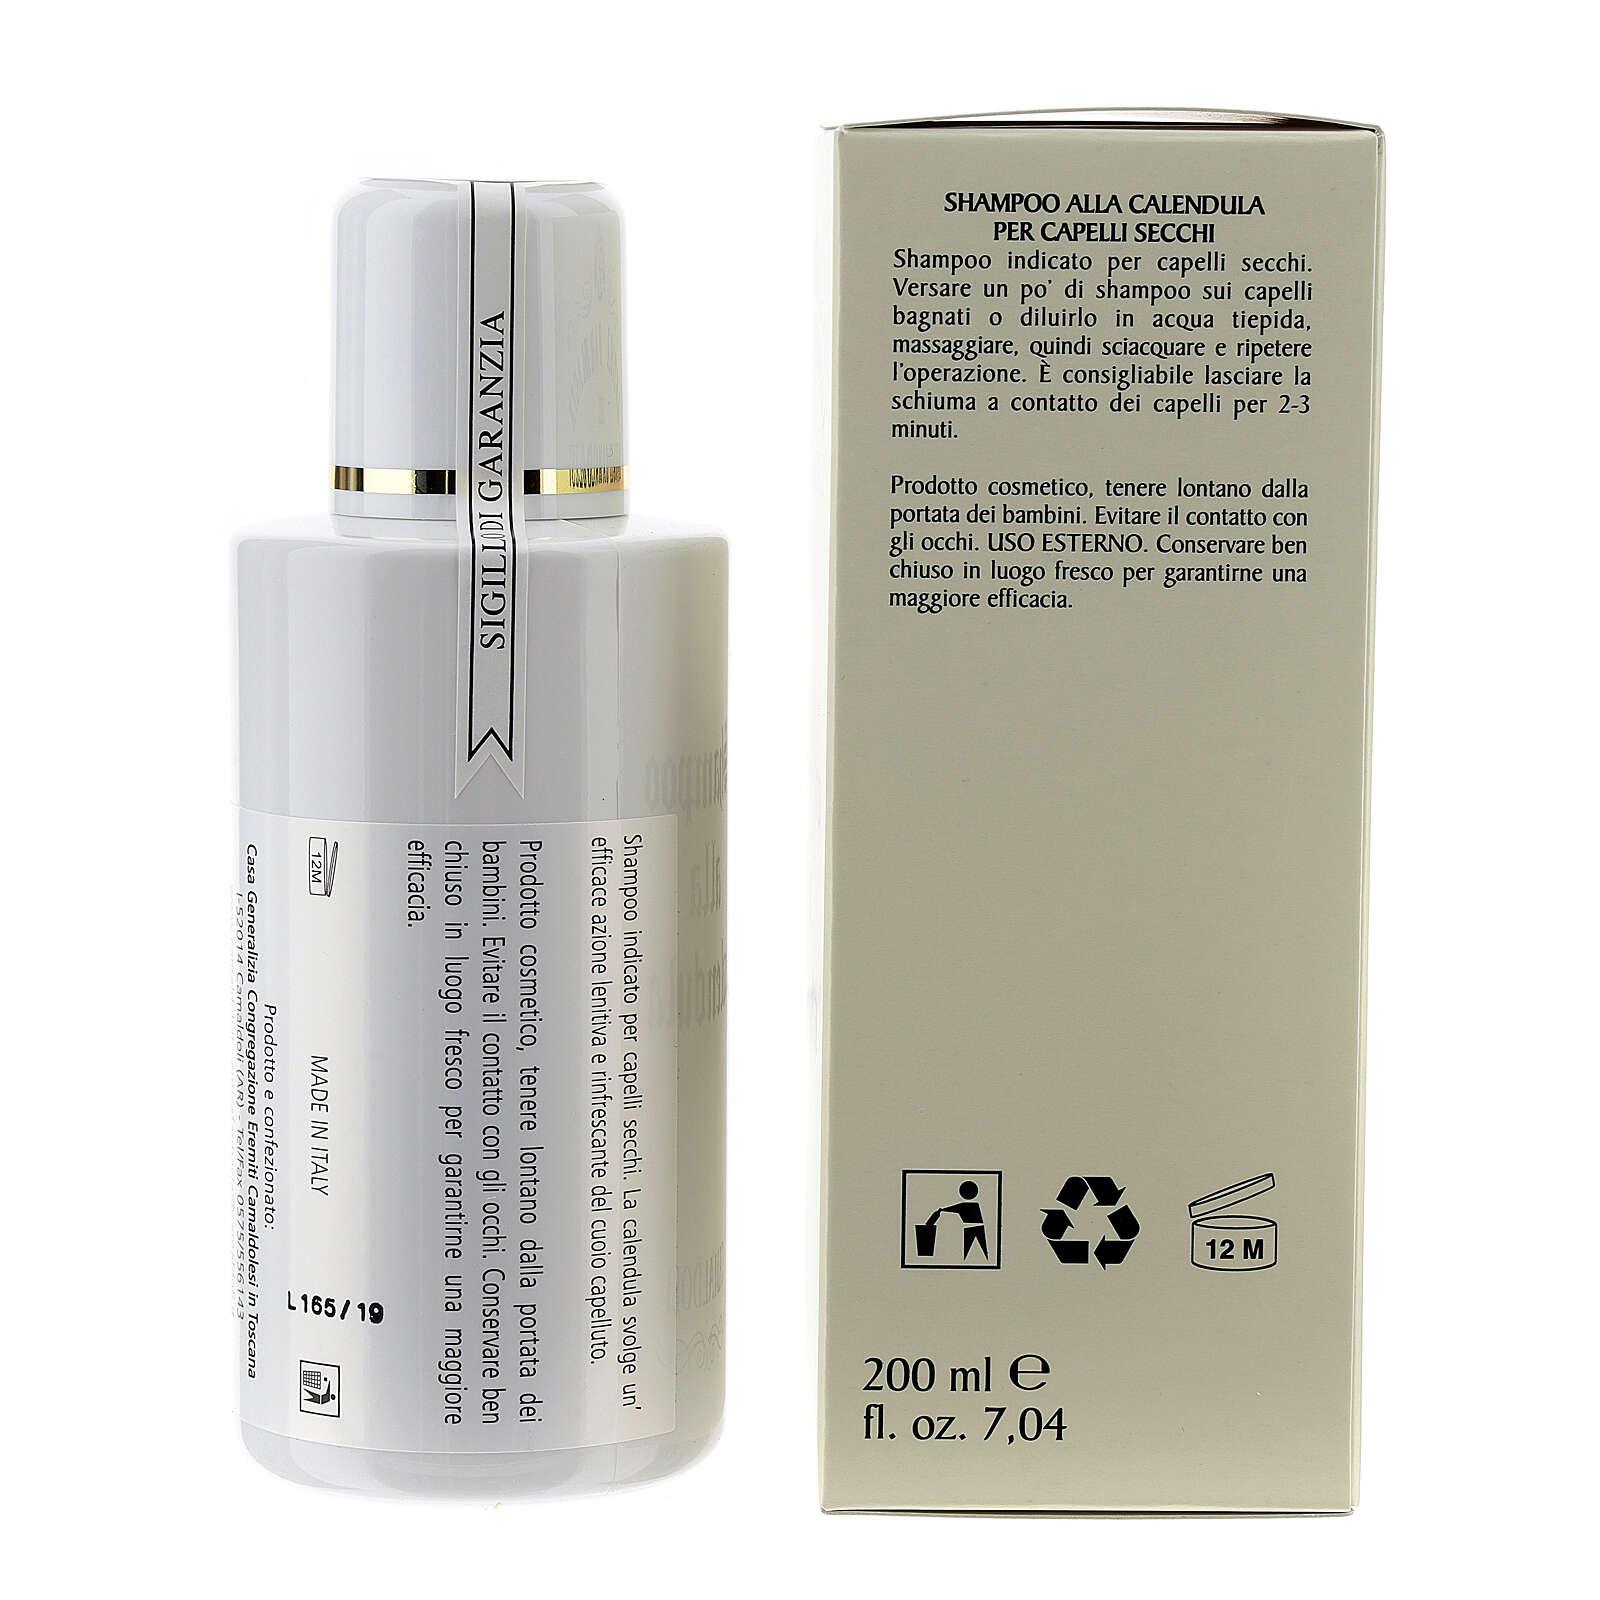 Kalendula-Shampoo (200 ml) 4